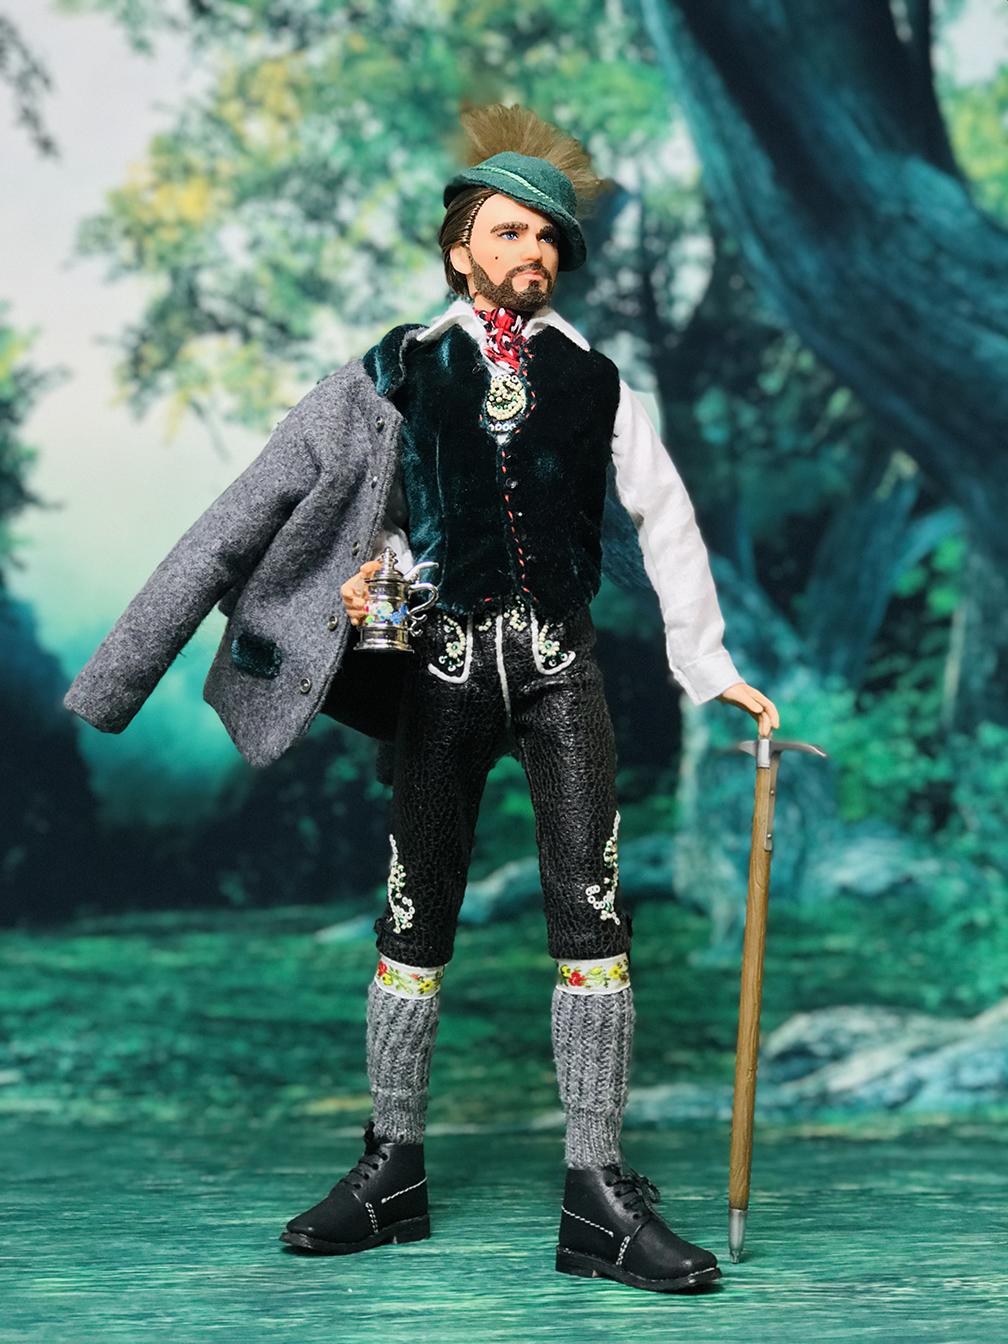 Bavarian Ken #2